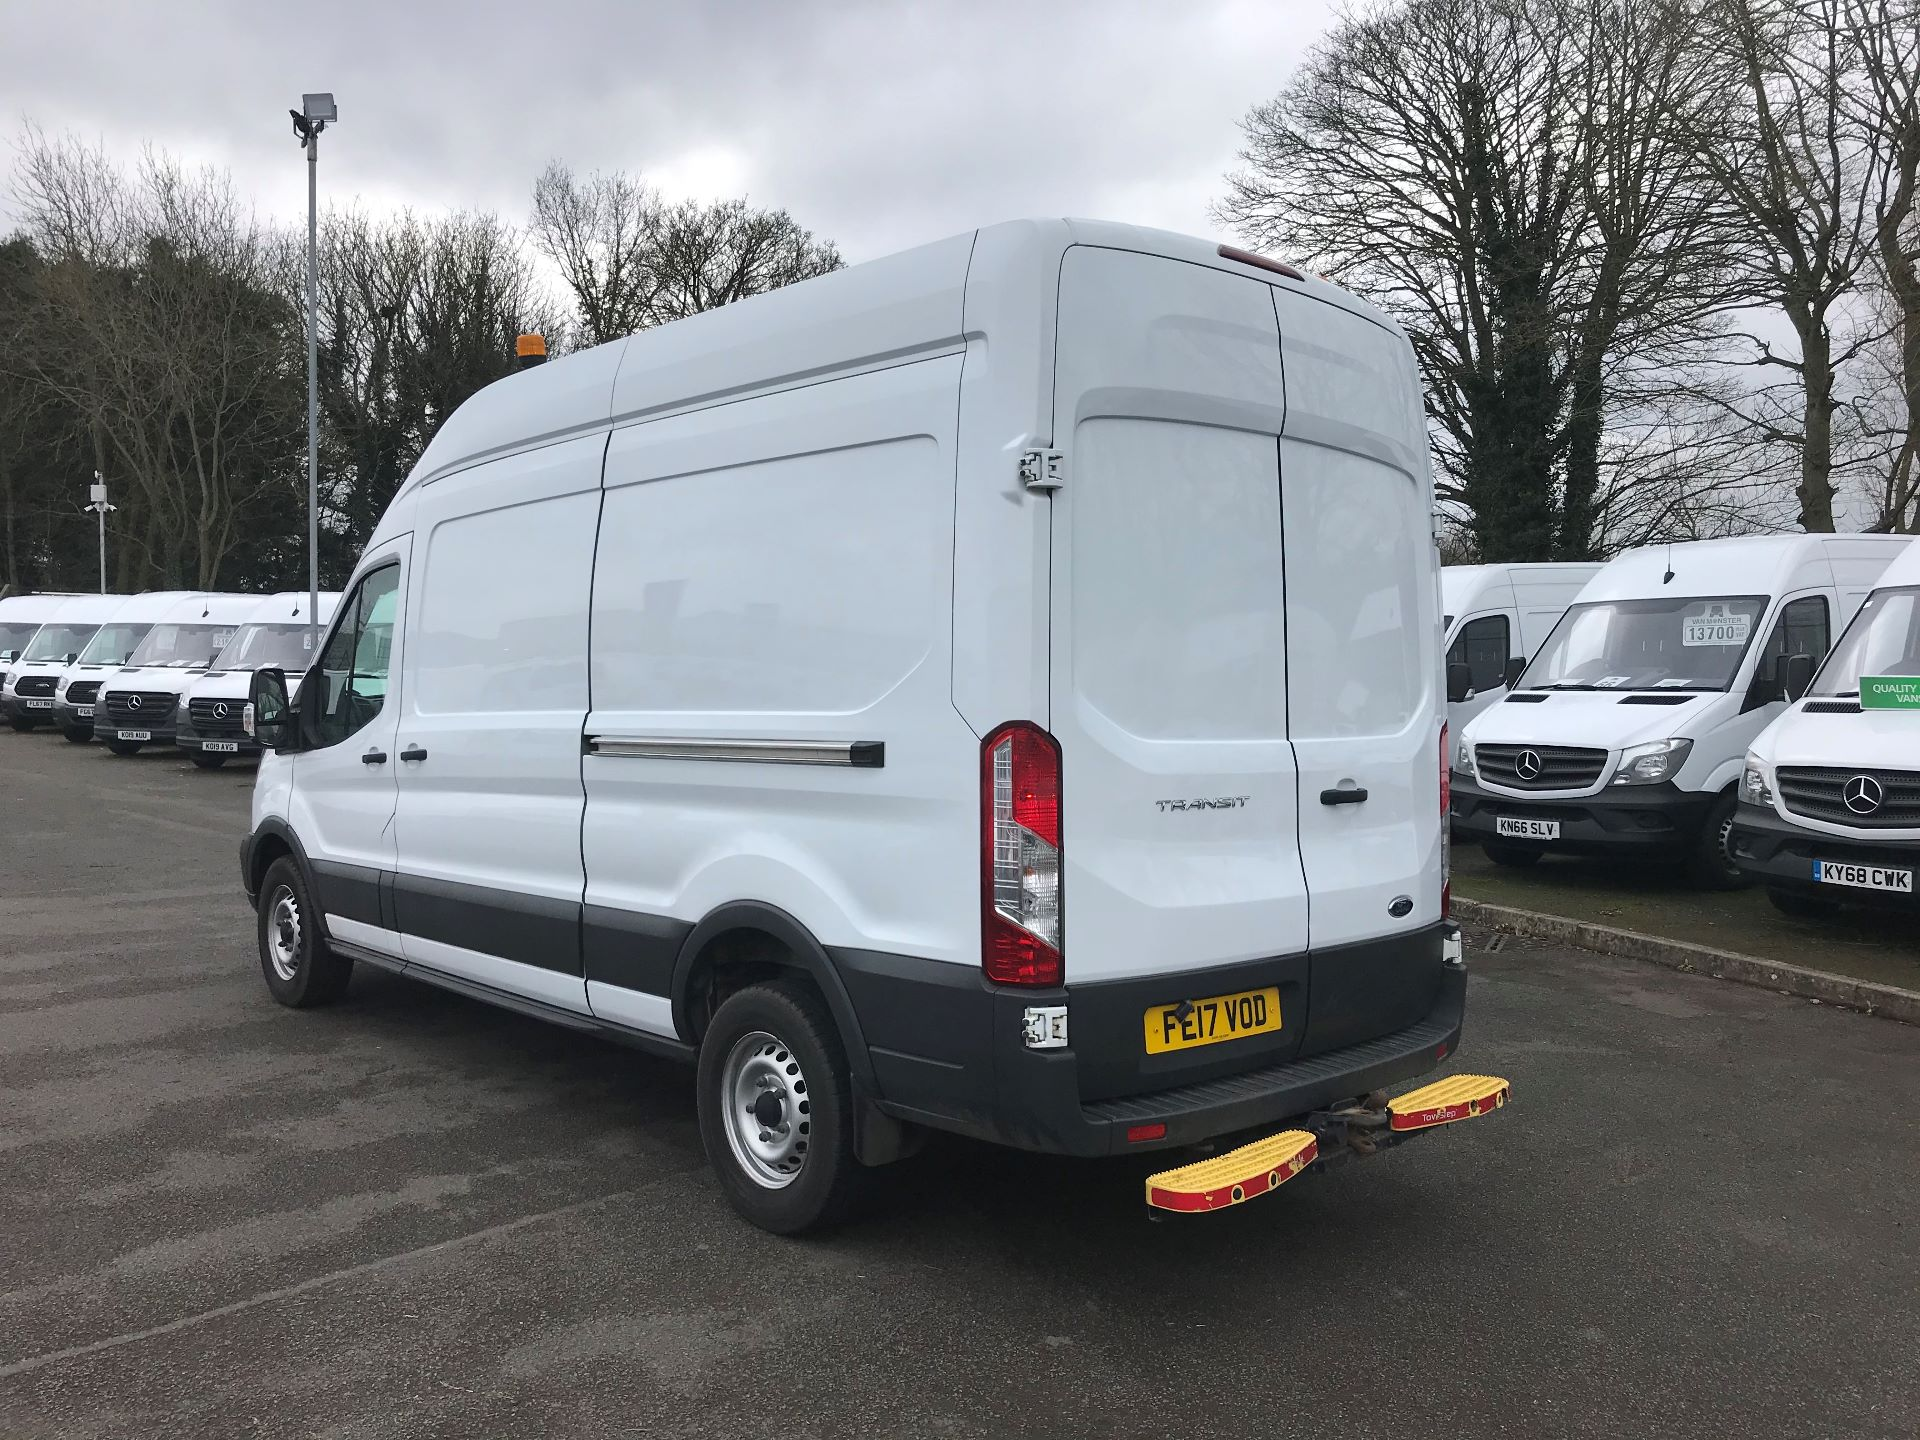 2017 Ford Transit L3 H3 VAN 130PS EURO 6 (FE17VOD) Image 6